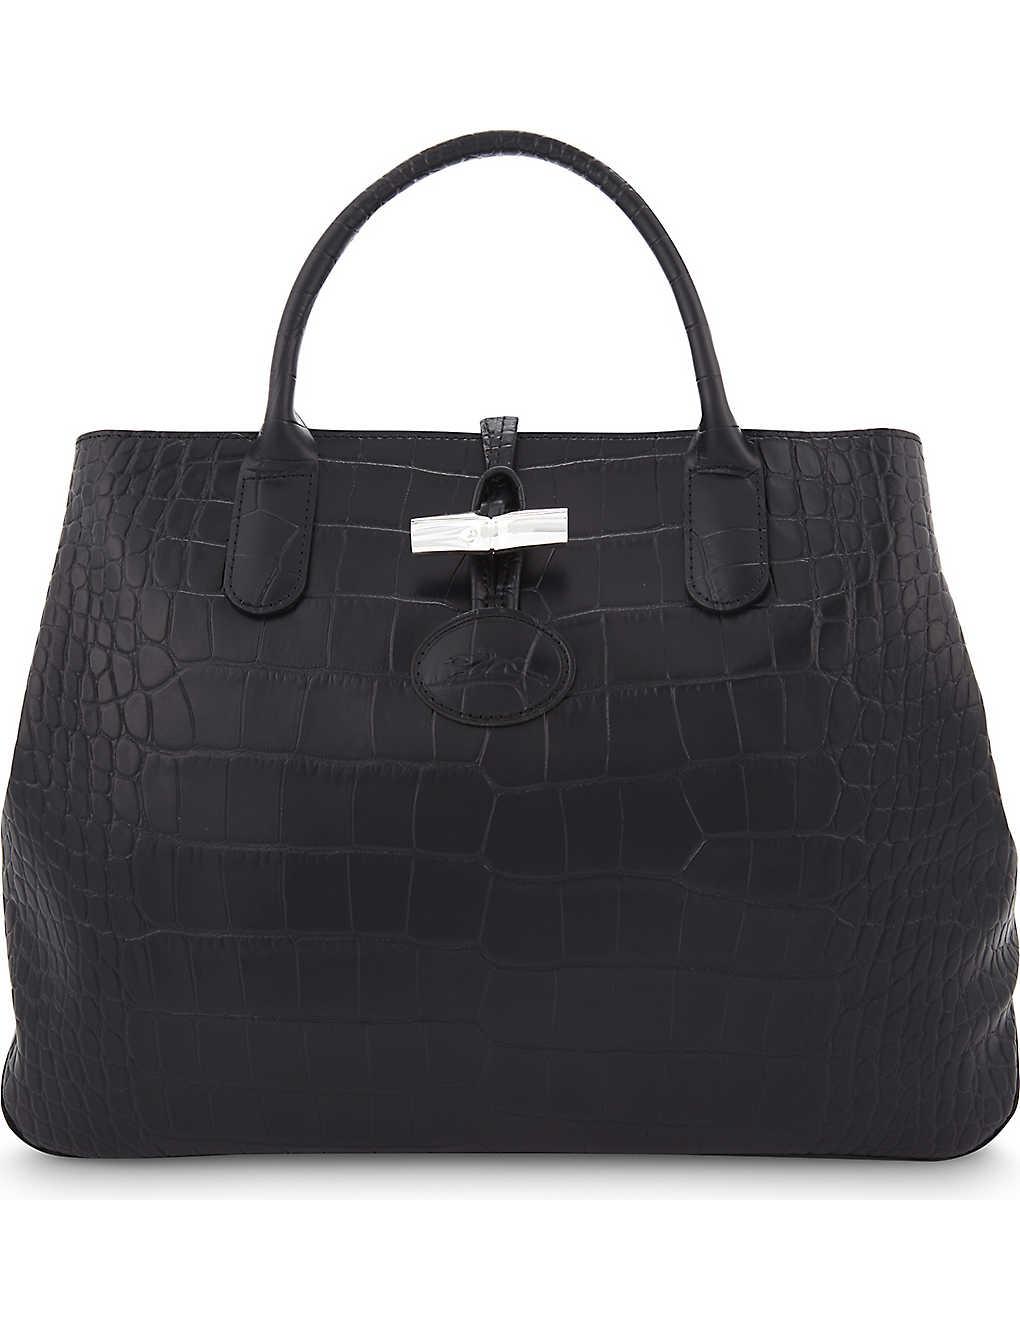 07e4dfe46fd LONGCHAMP - Roseau medium leather tote | Selfridges.com